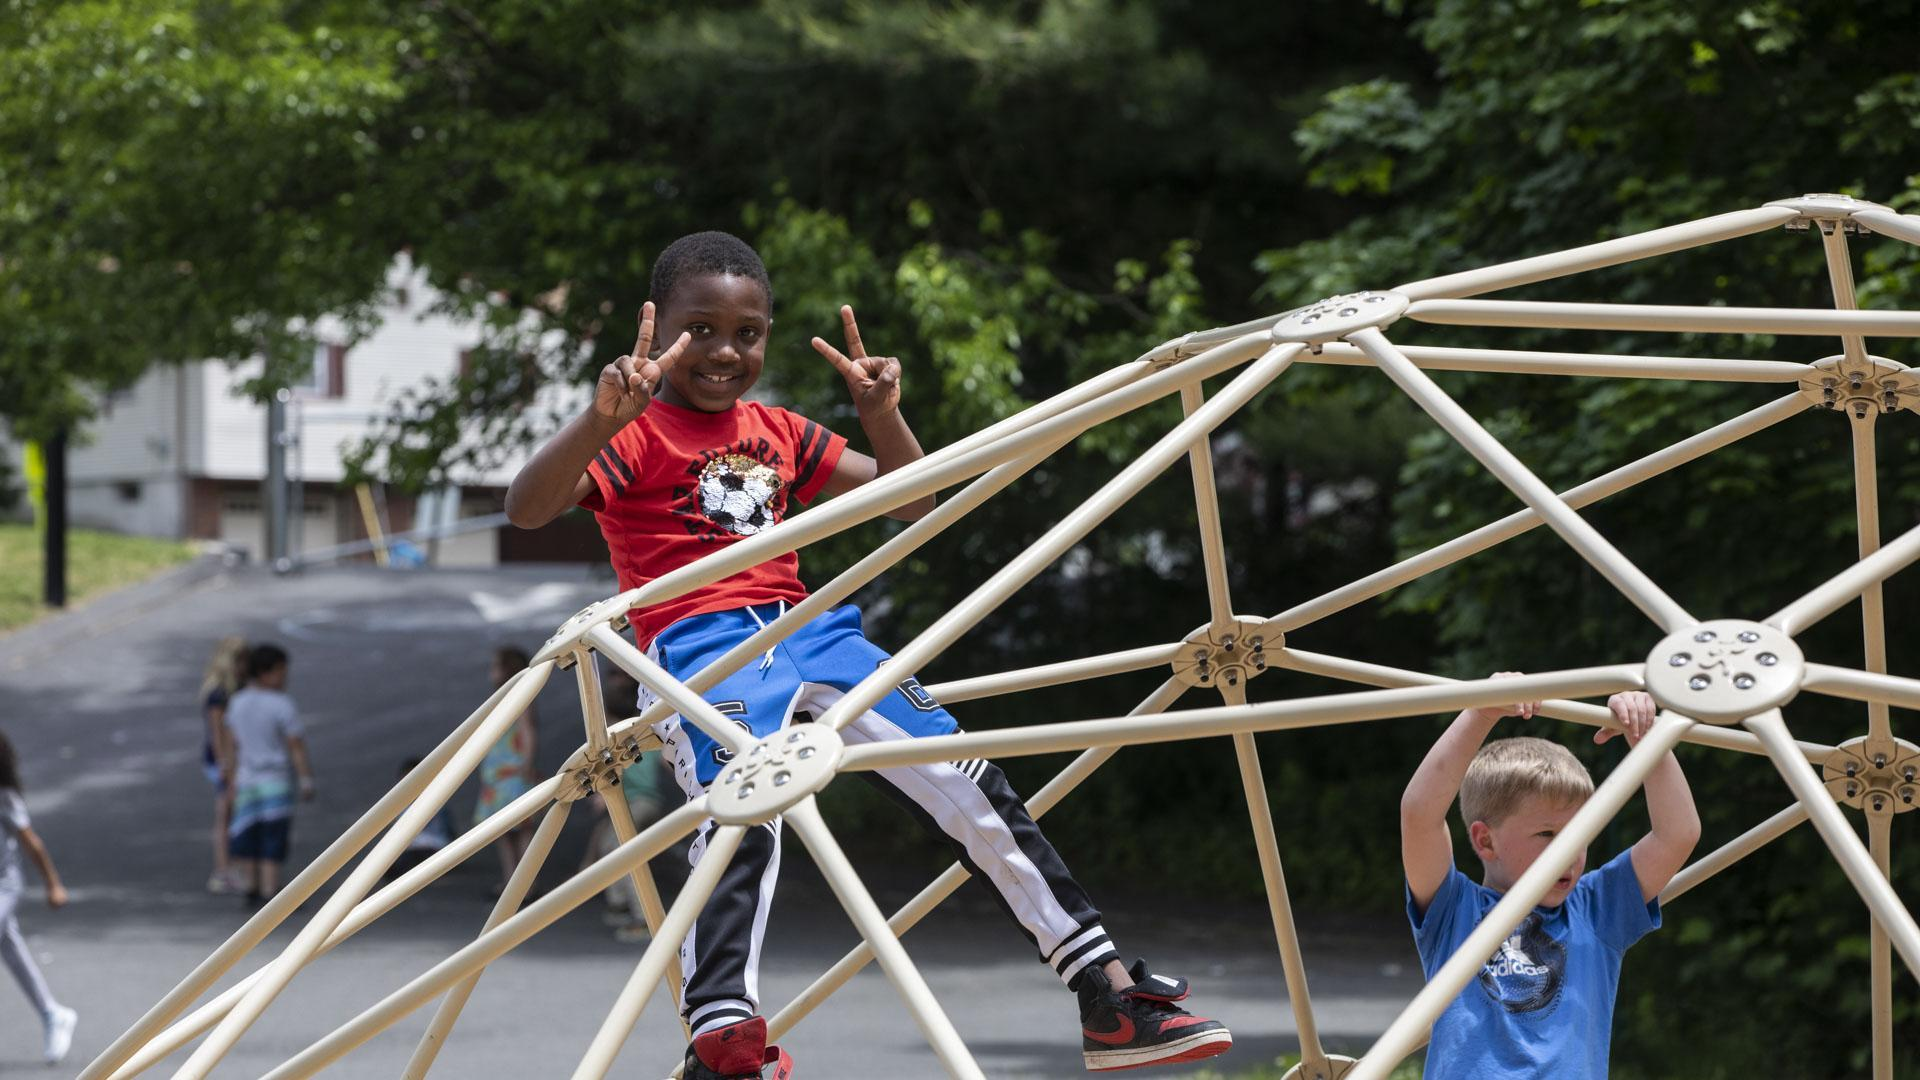 Two boys climbing on playground equipment